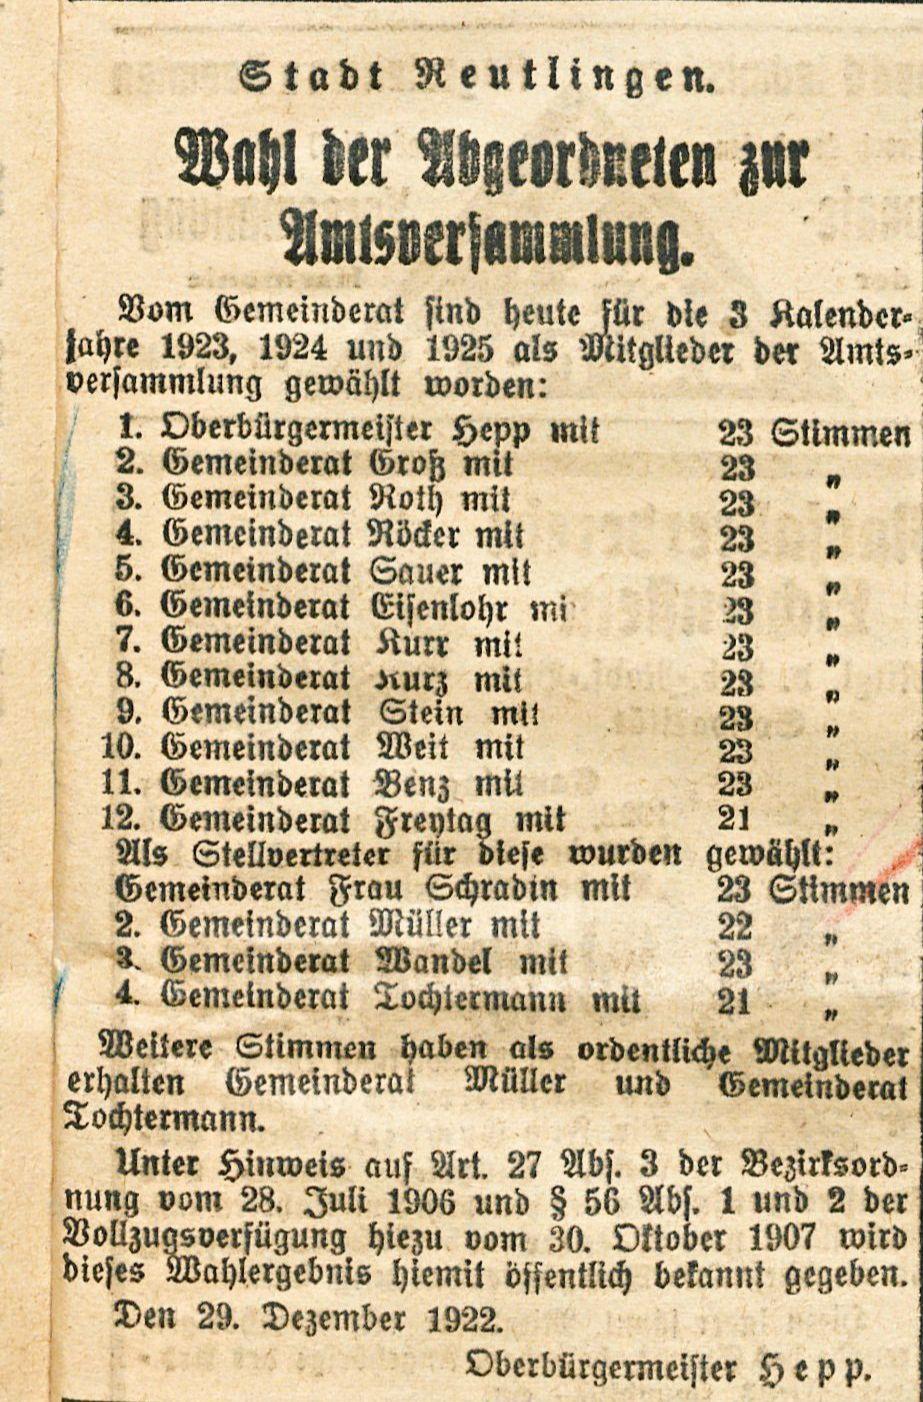 Reutlinger Amtsblatt aus dem Jahr 1922